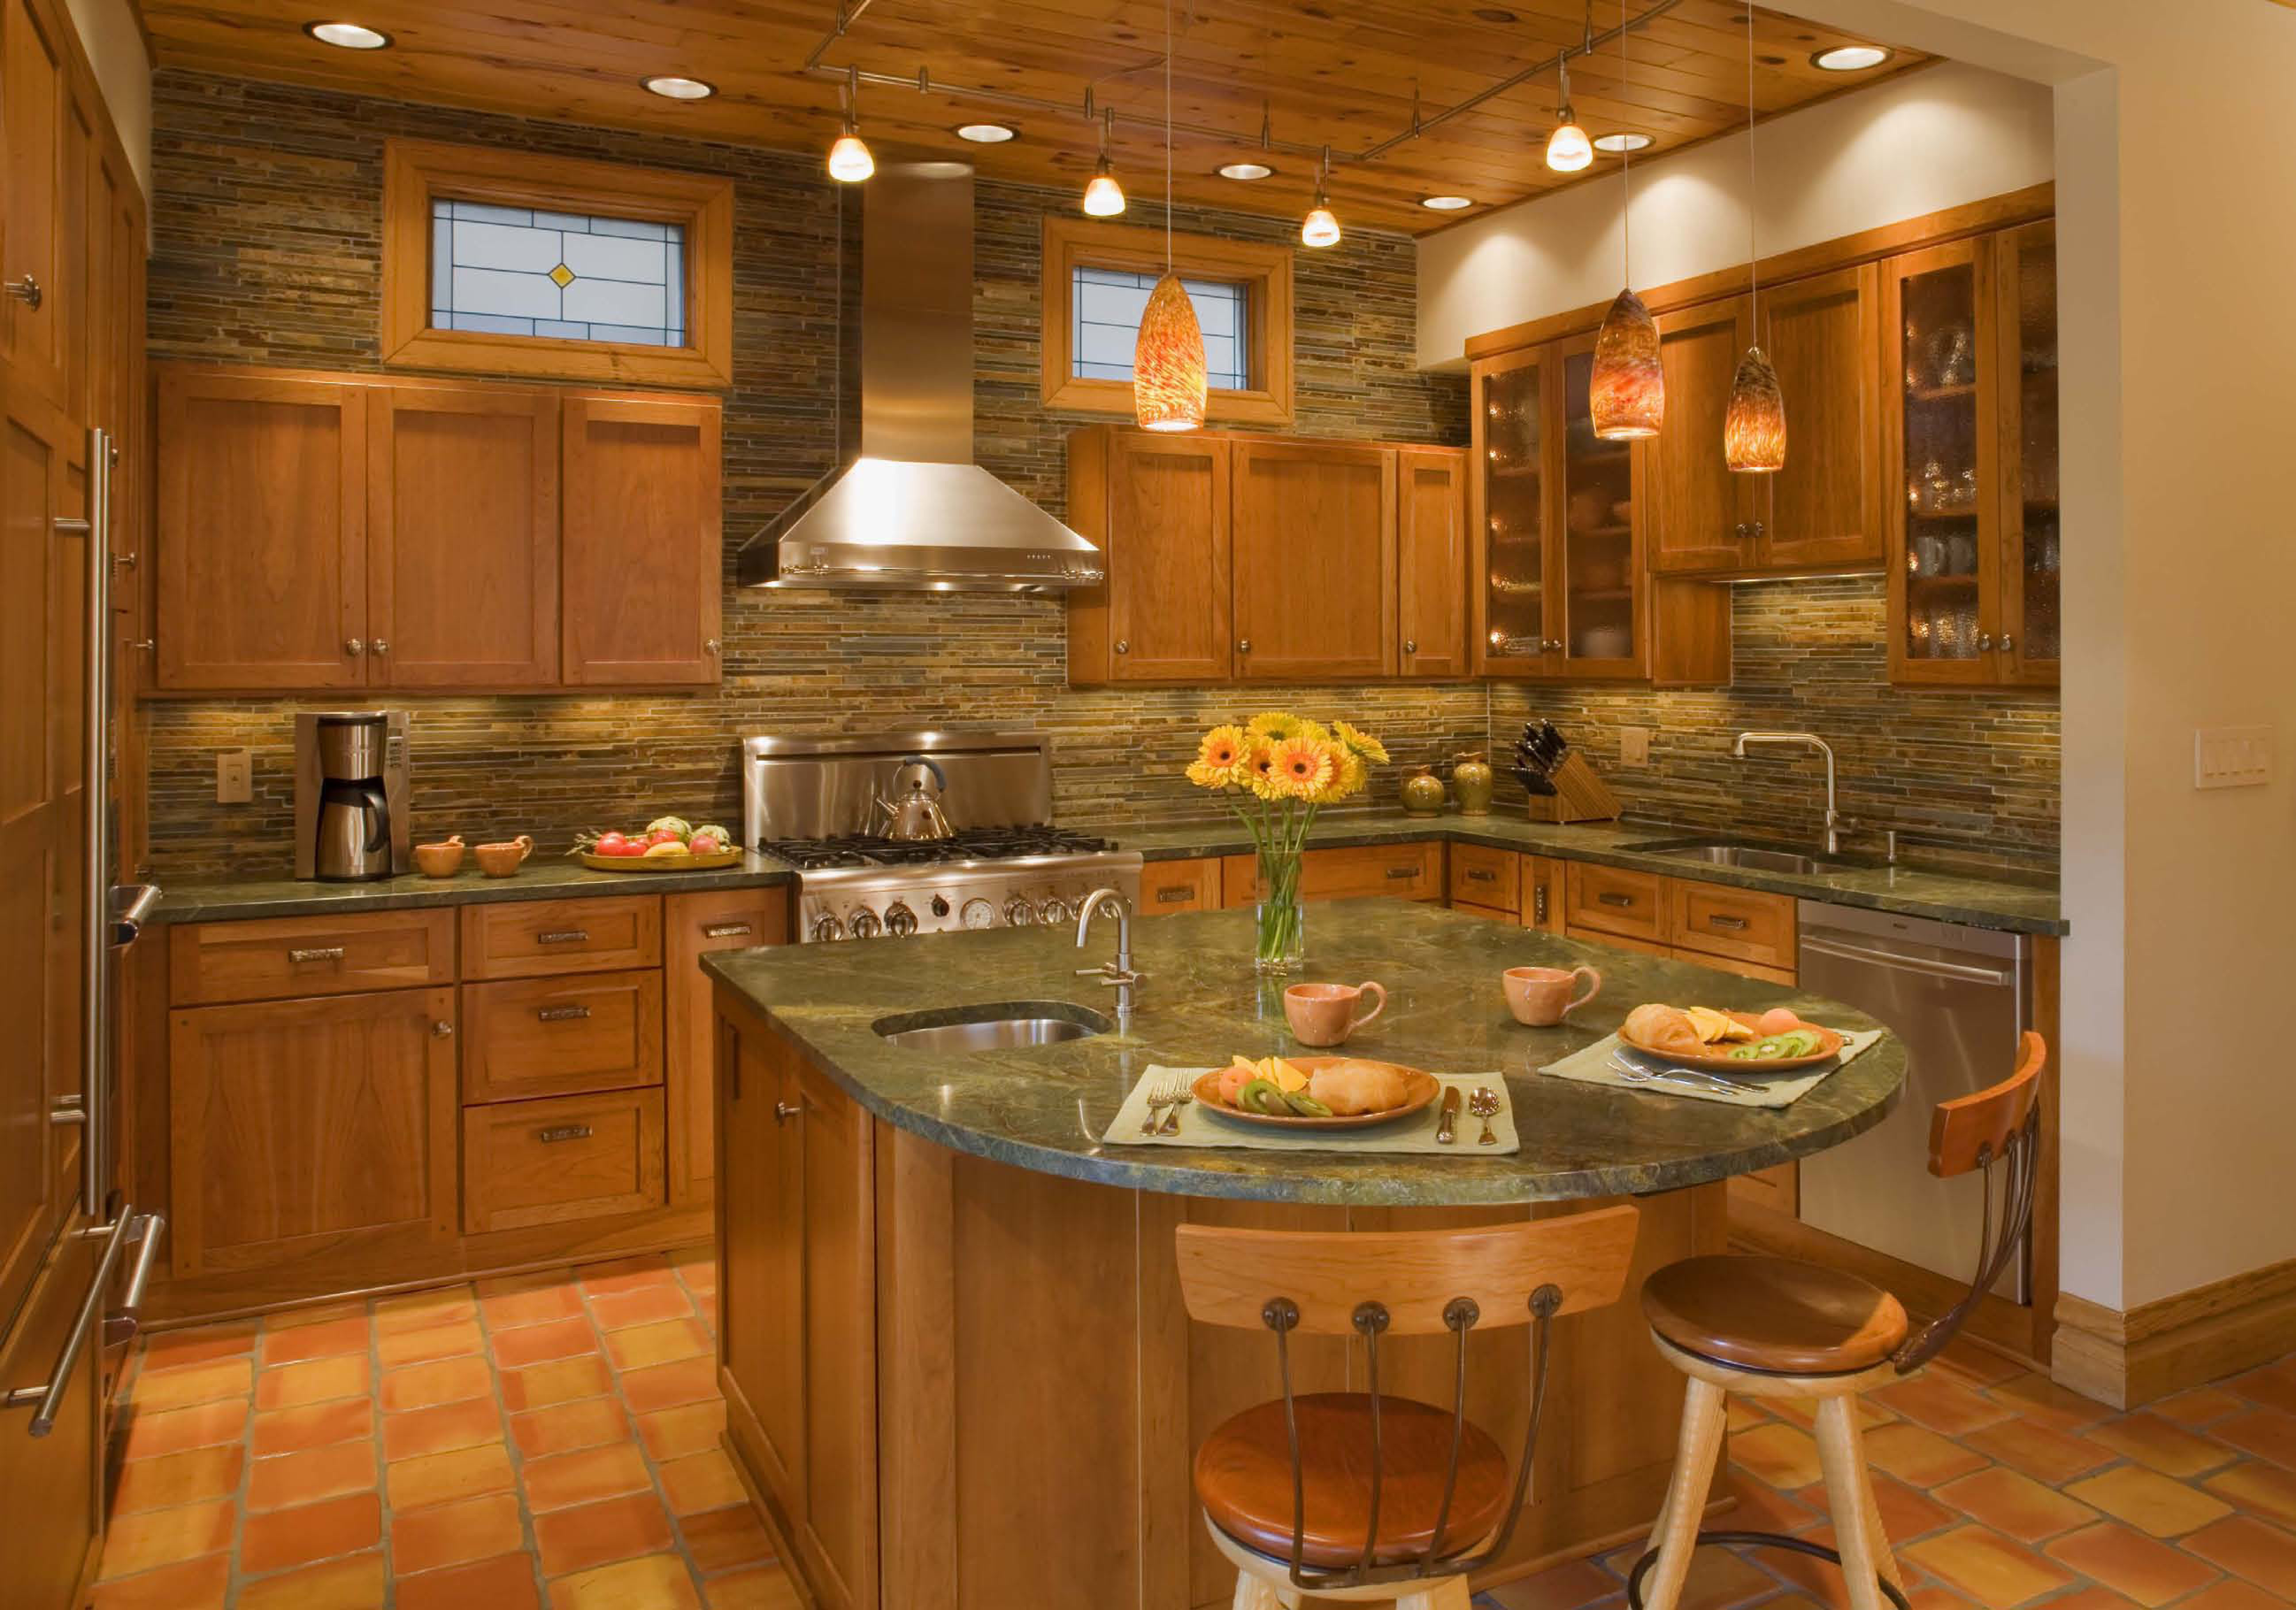 small kitchen countertop ideas photo - 1